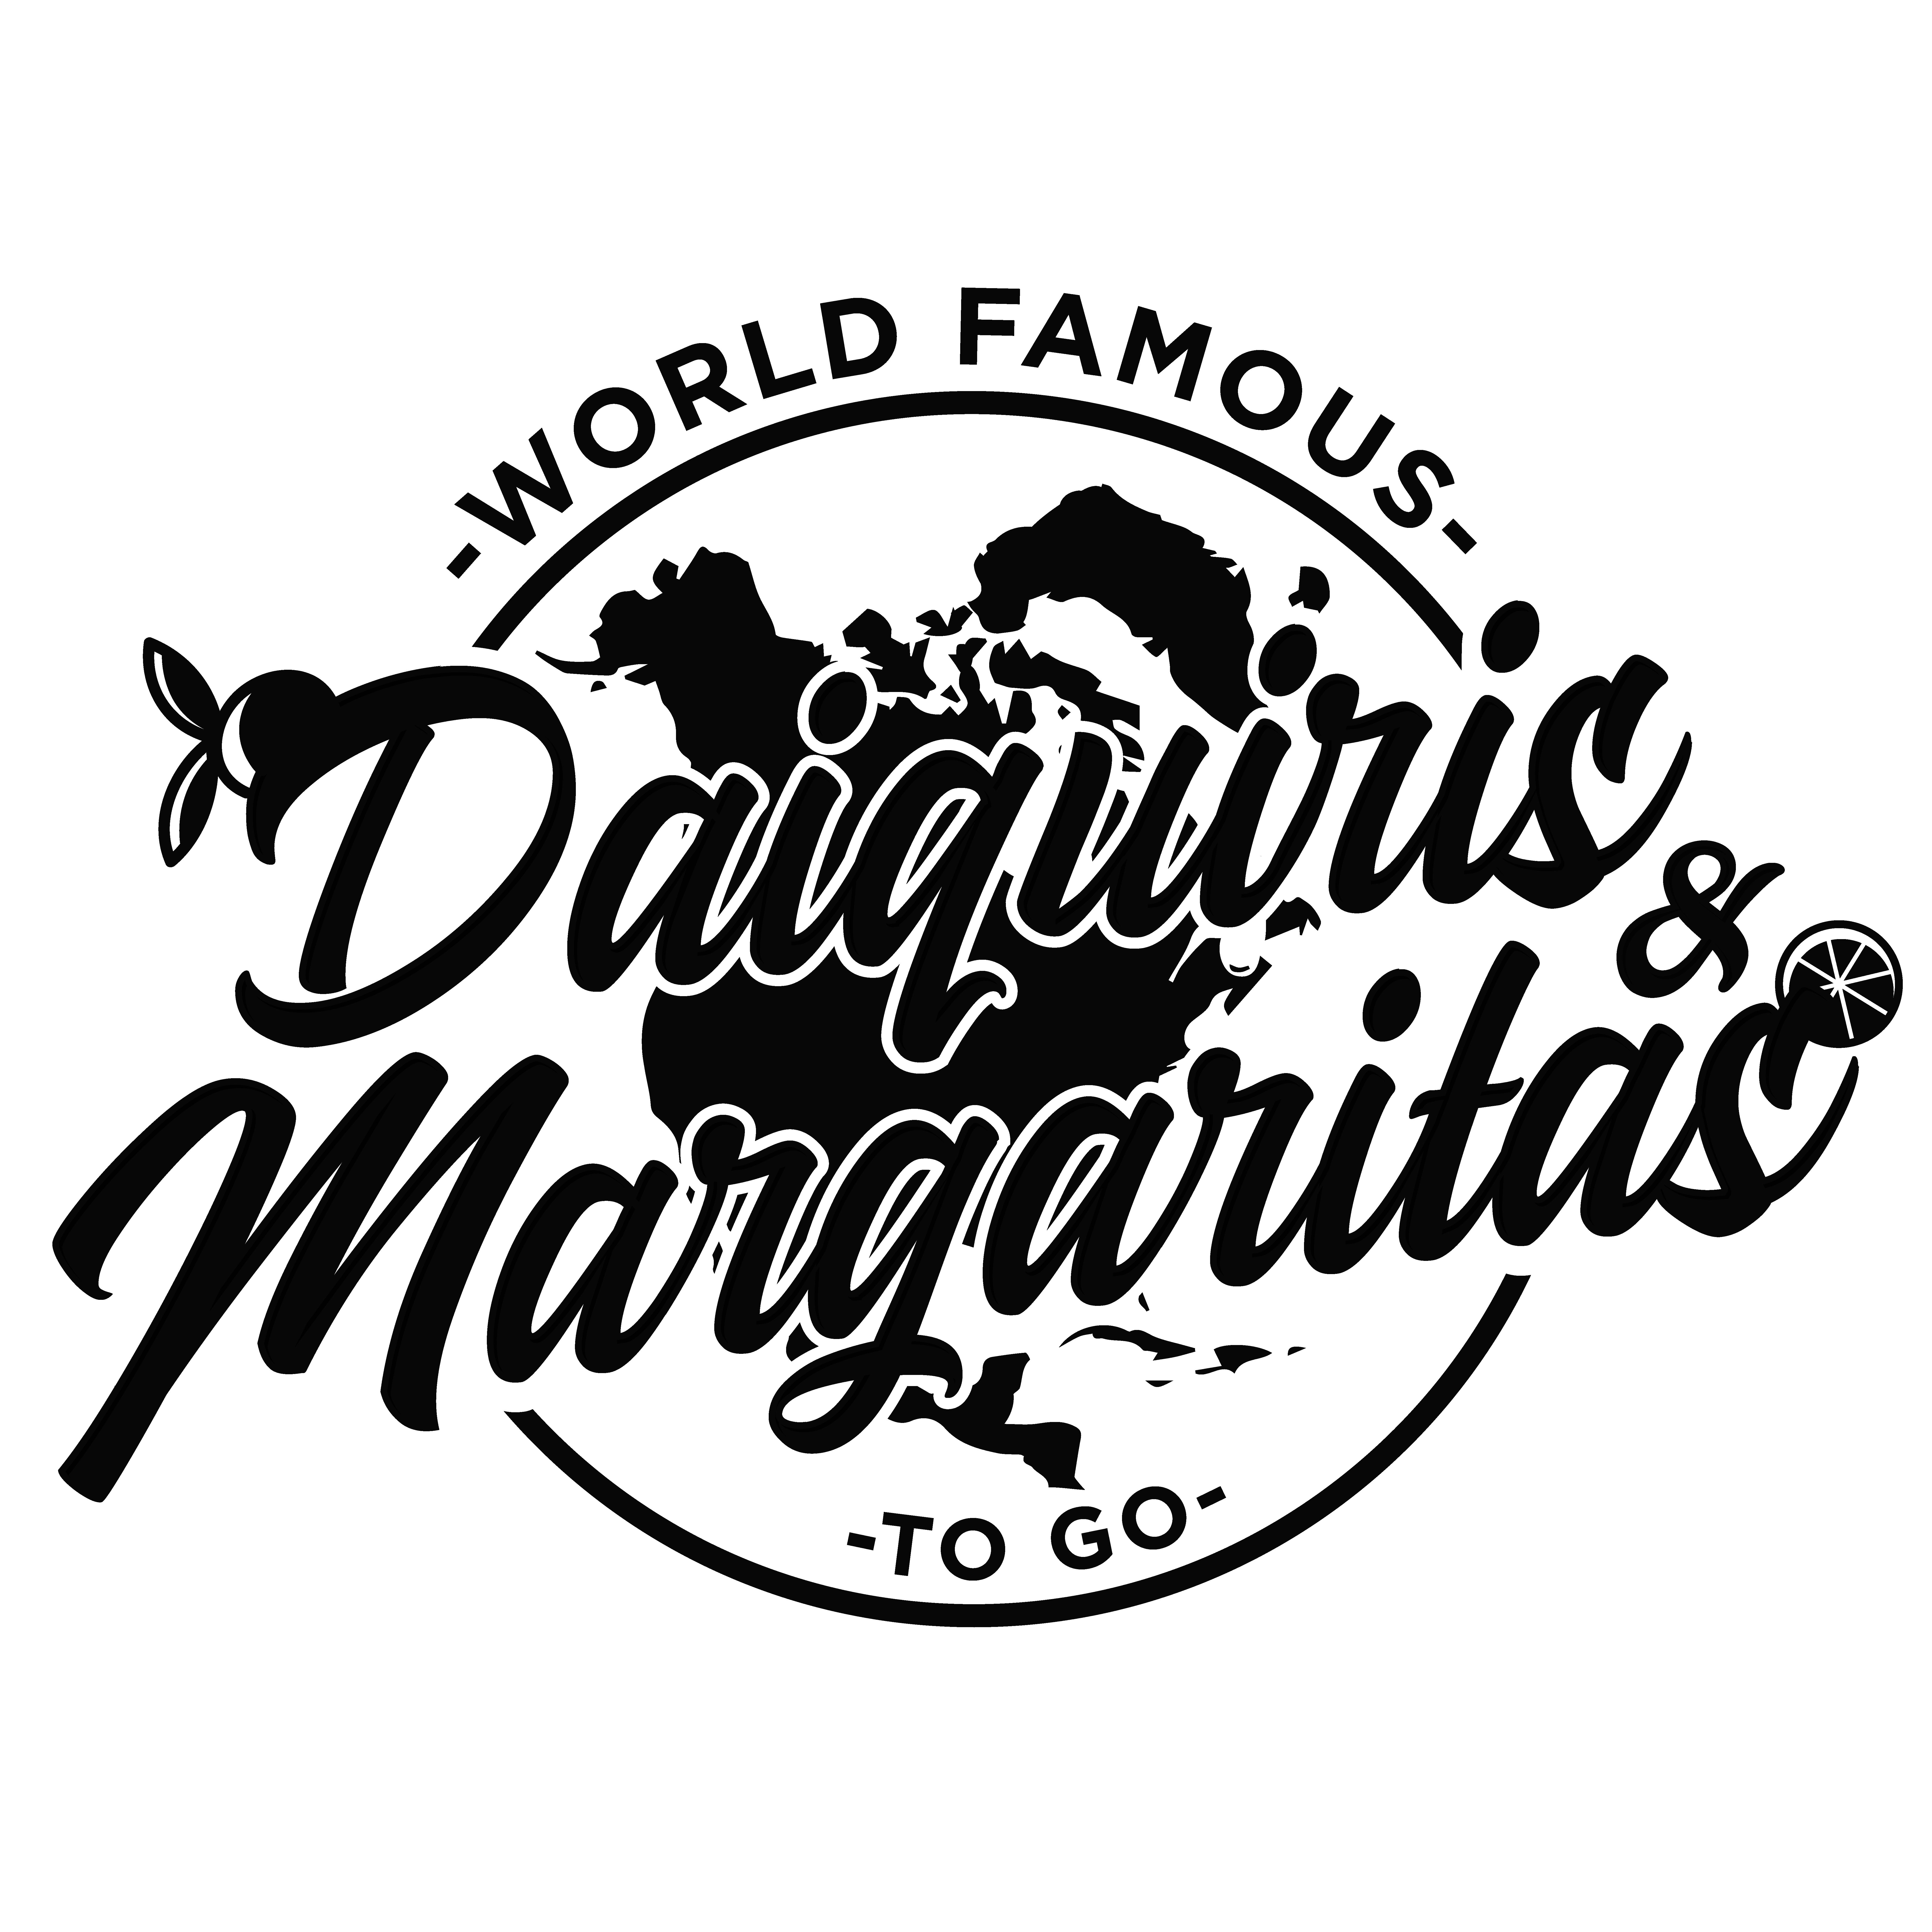 World Famous Daiquiris seeks global exposure